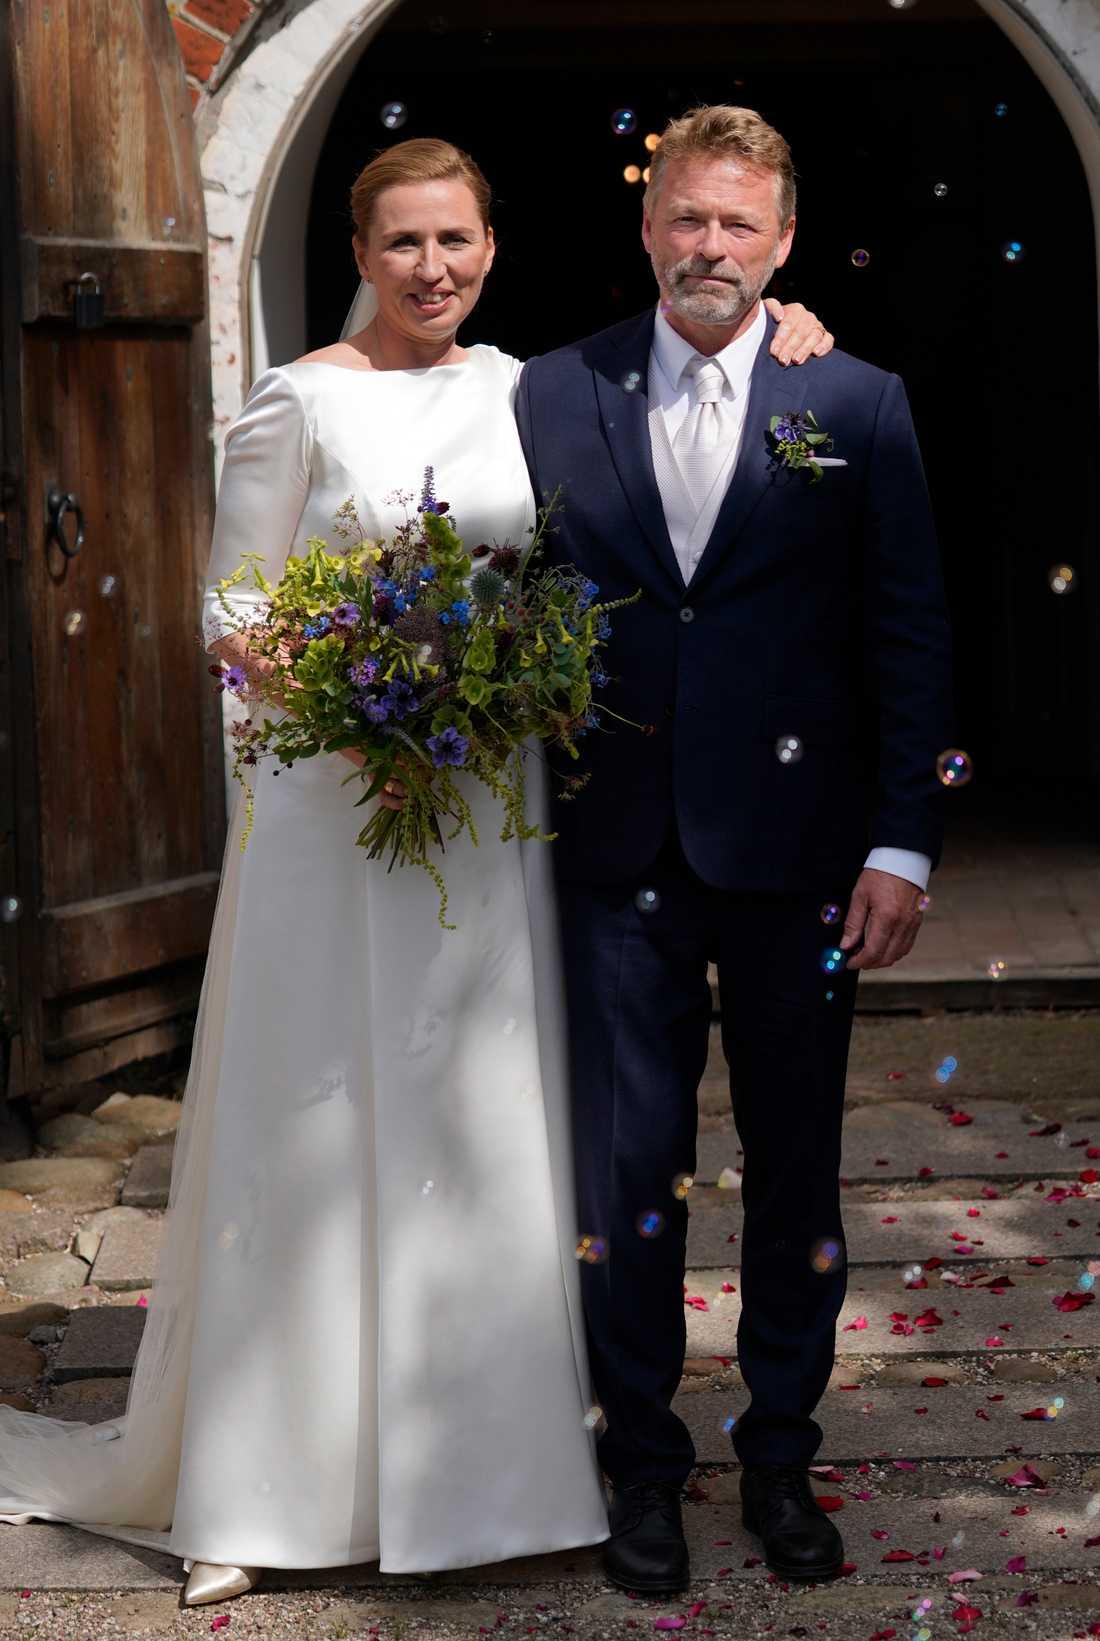 Danmarks statsminister Mette Frederiksen har gift sig med fotograf Bo Tengberg i Magleby kyrka.